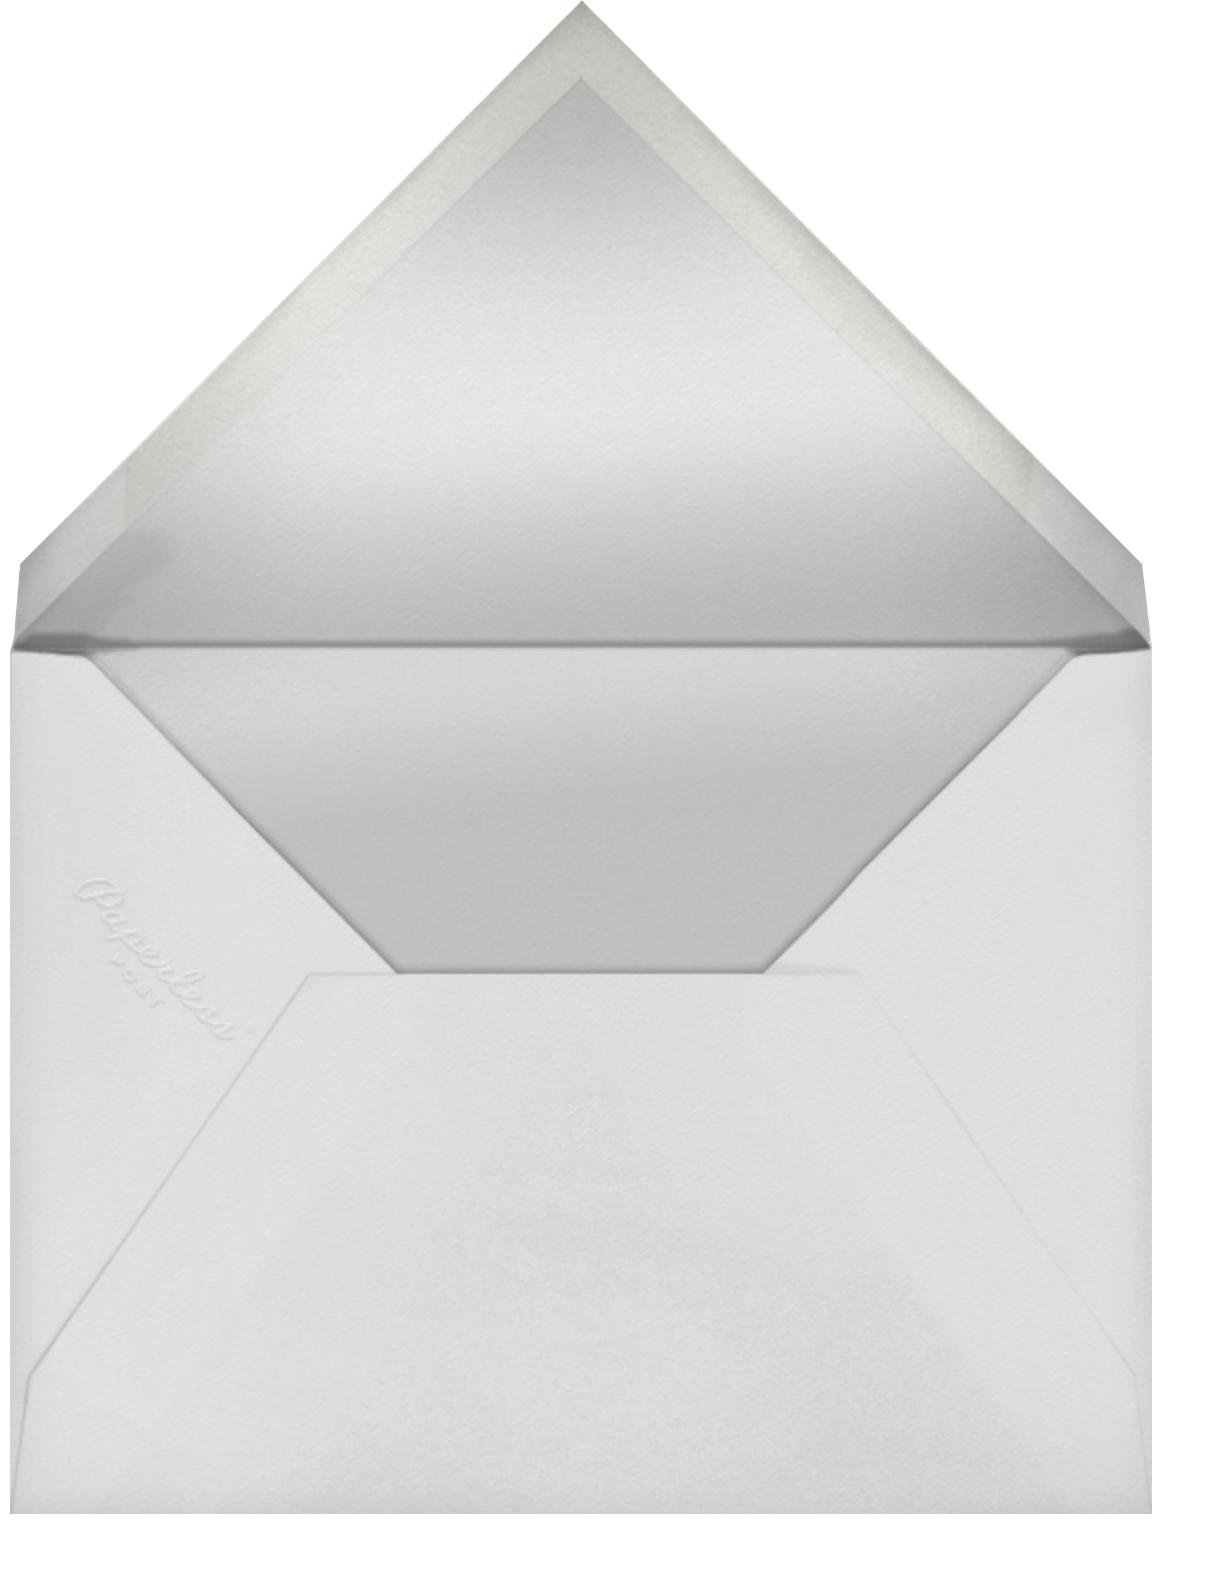 Palermo (Menu) - Gold - Paperless Post - Menus - envelope back